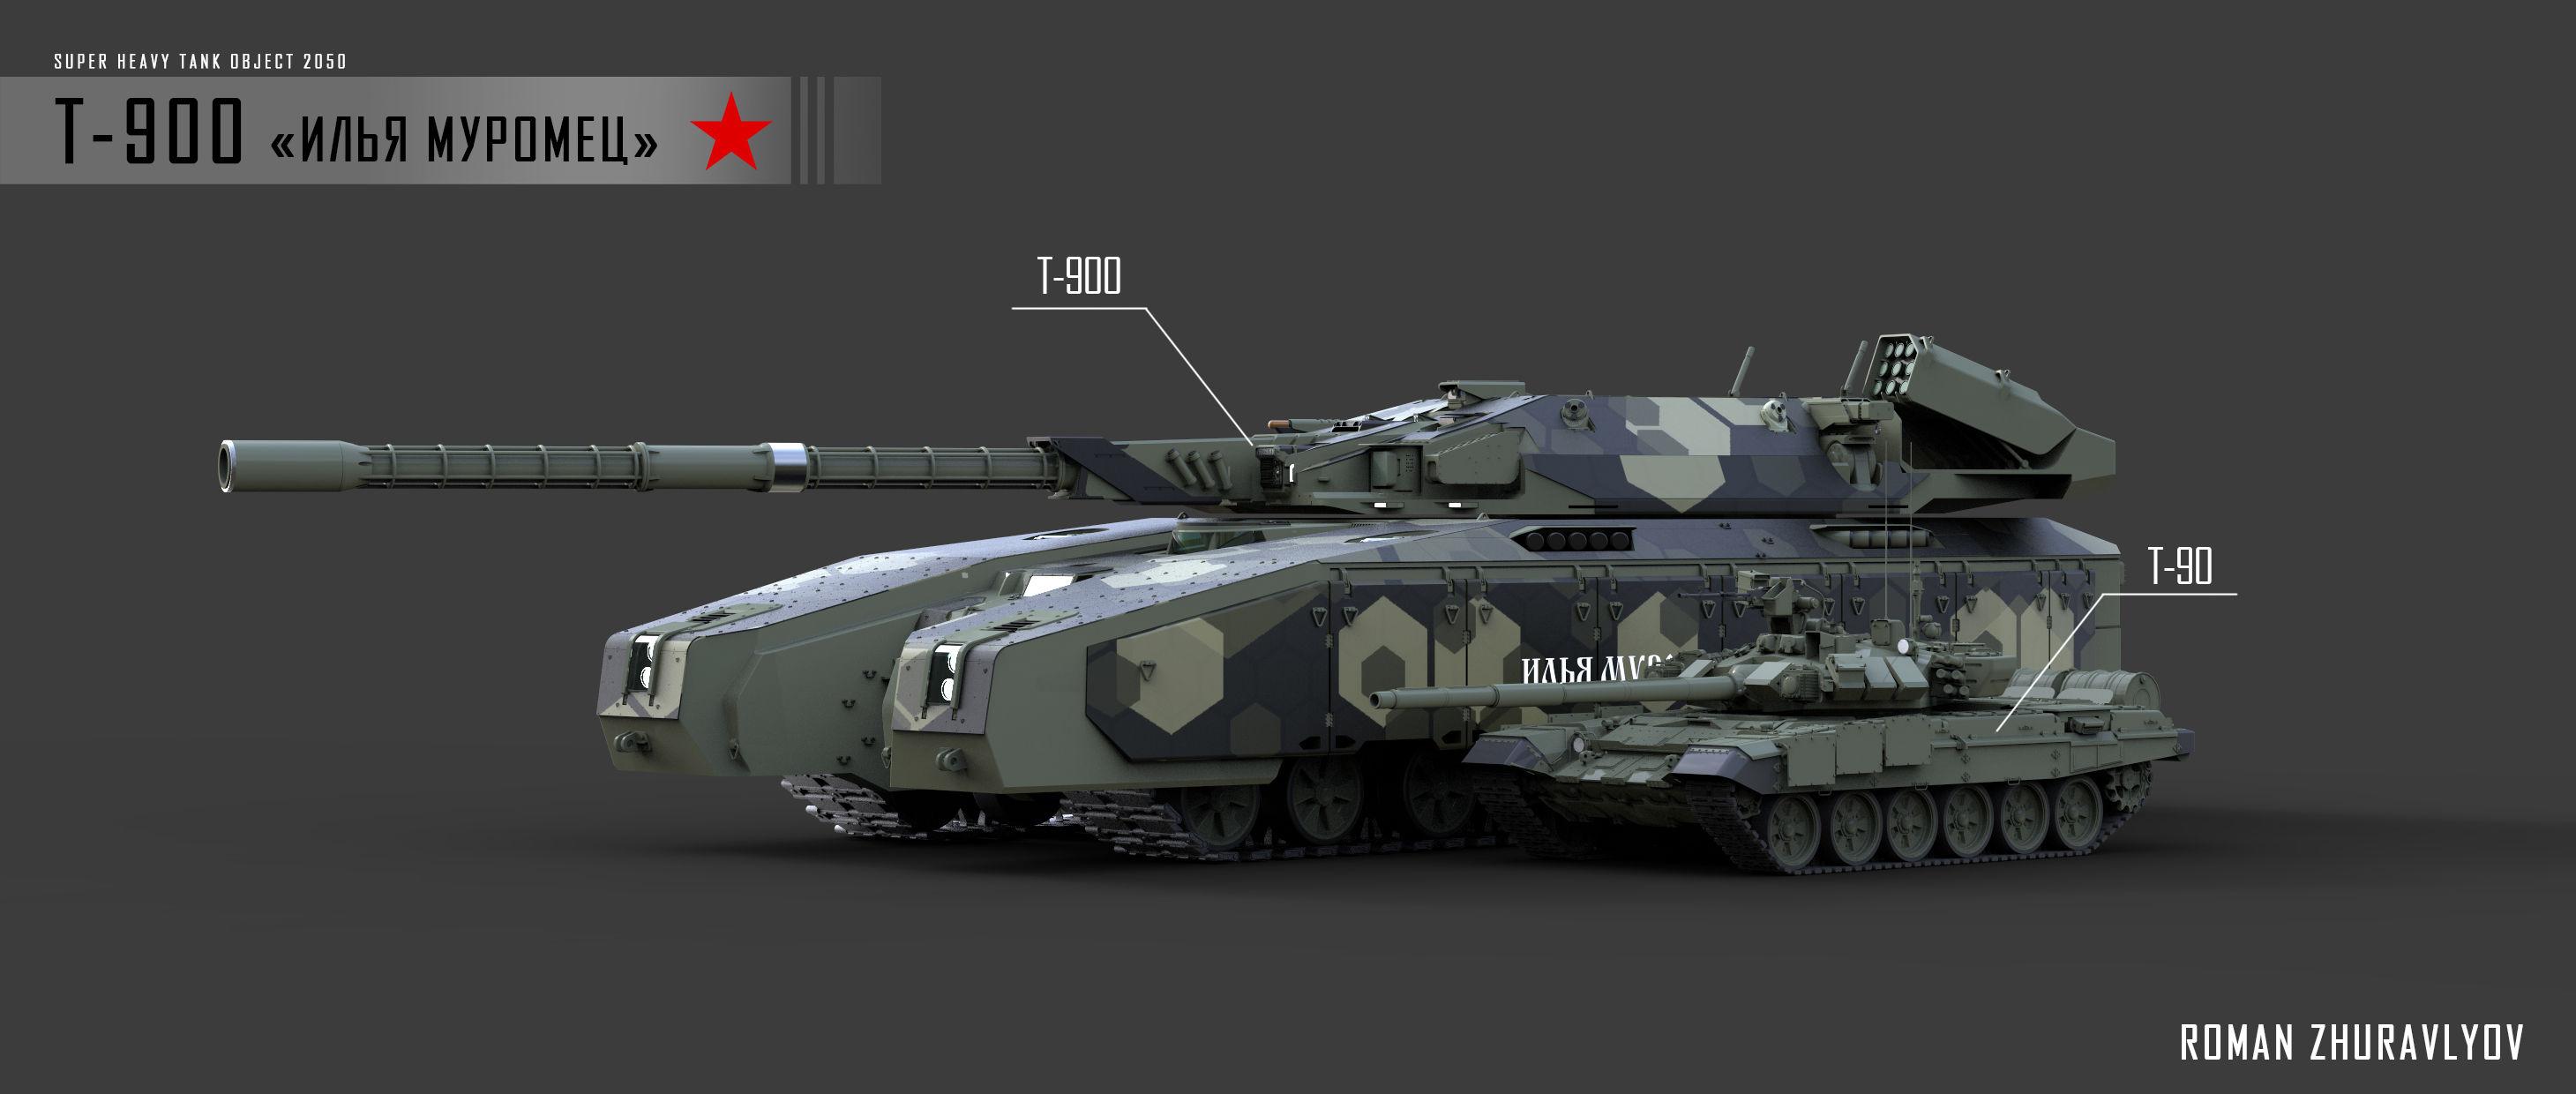 T-900-4-3500-3500